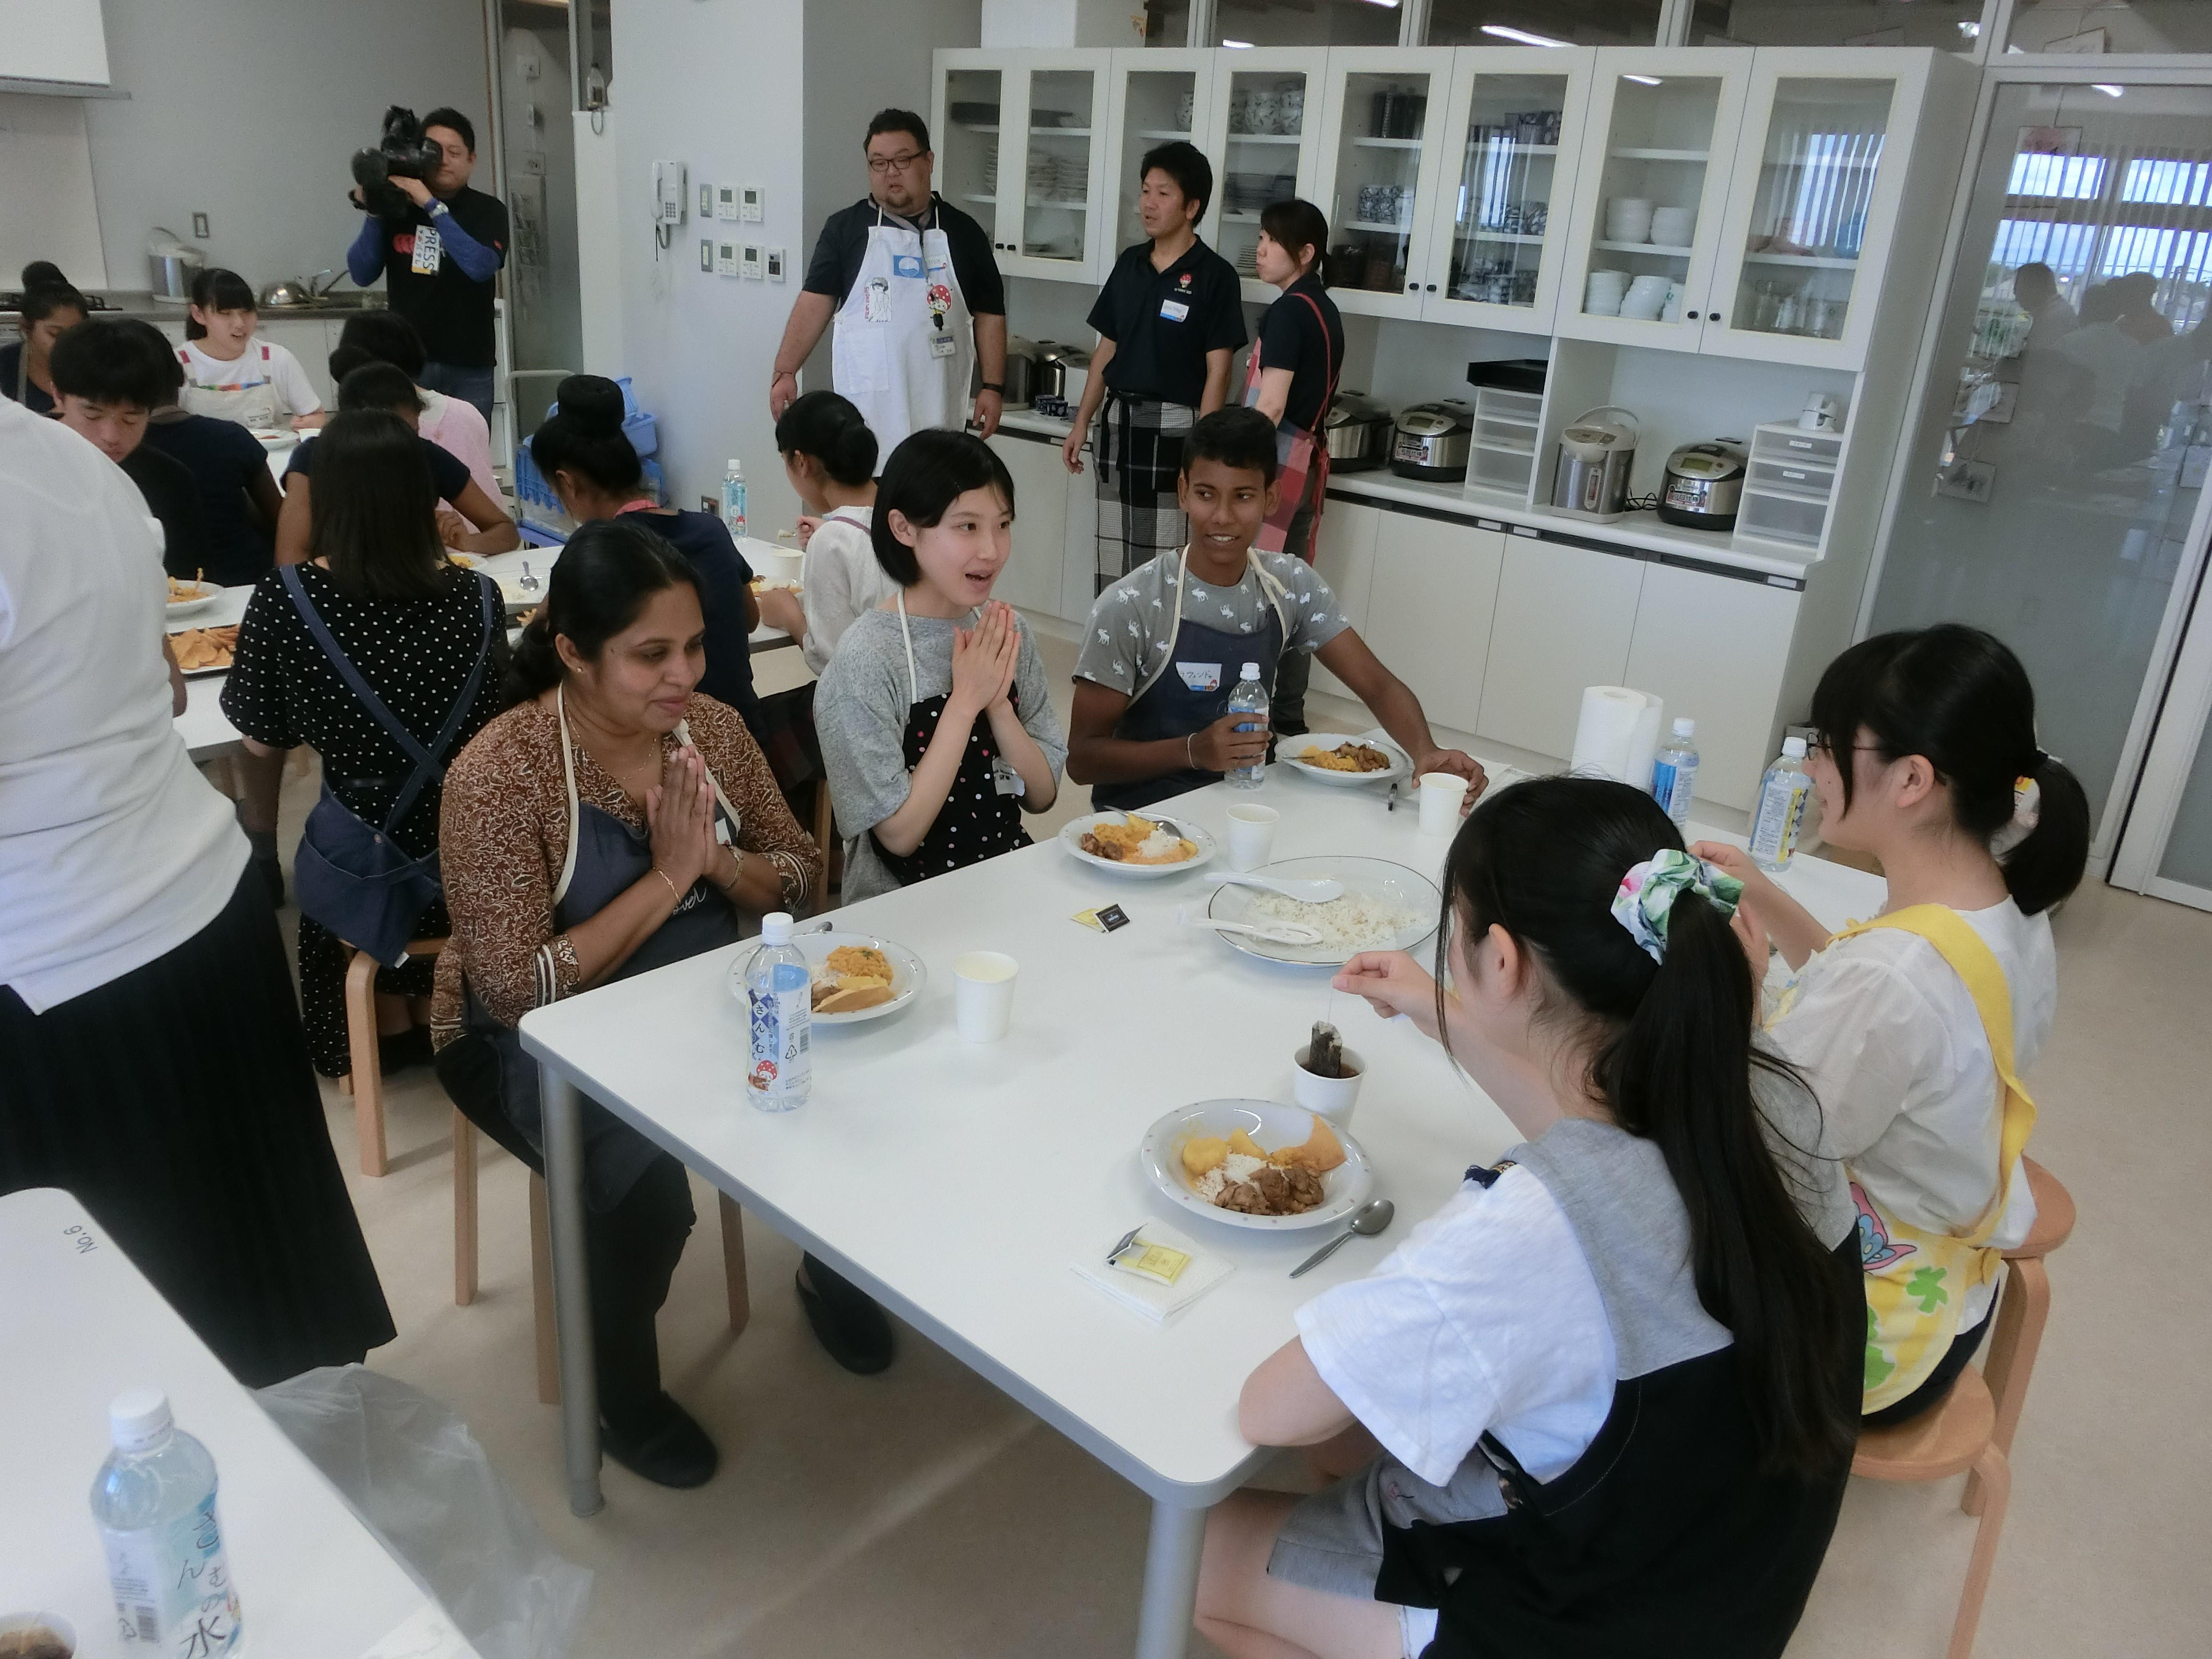 SNECCと日本の学生が一緒にカレーを食べる